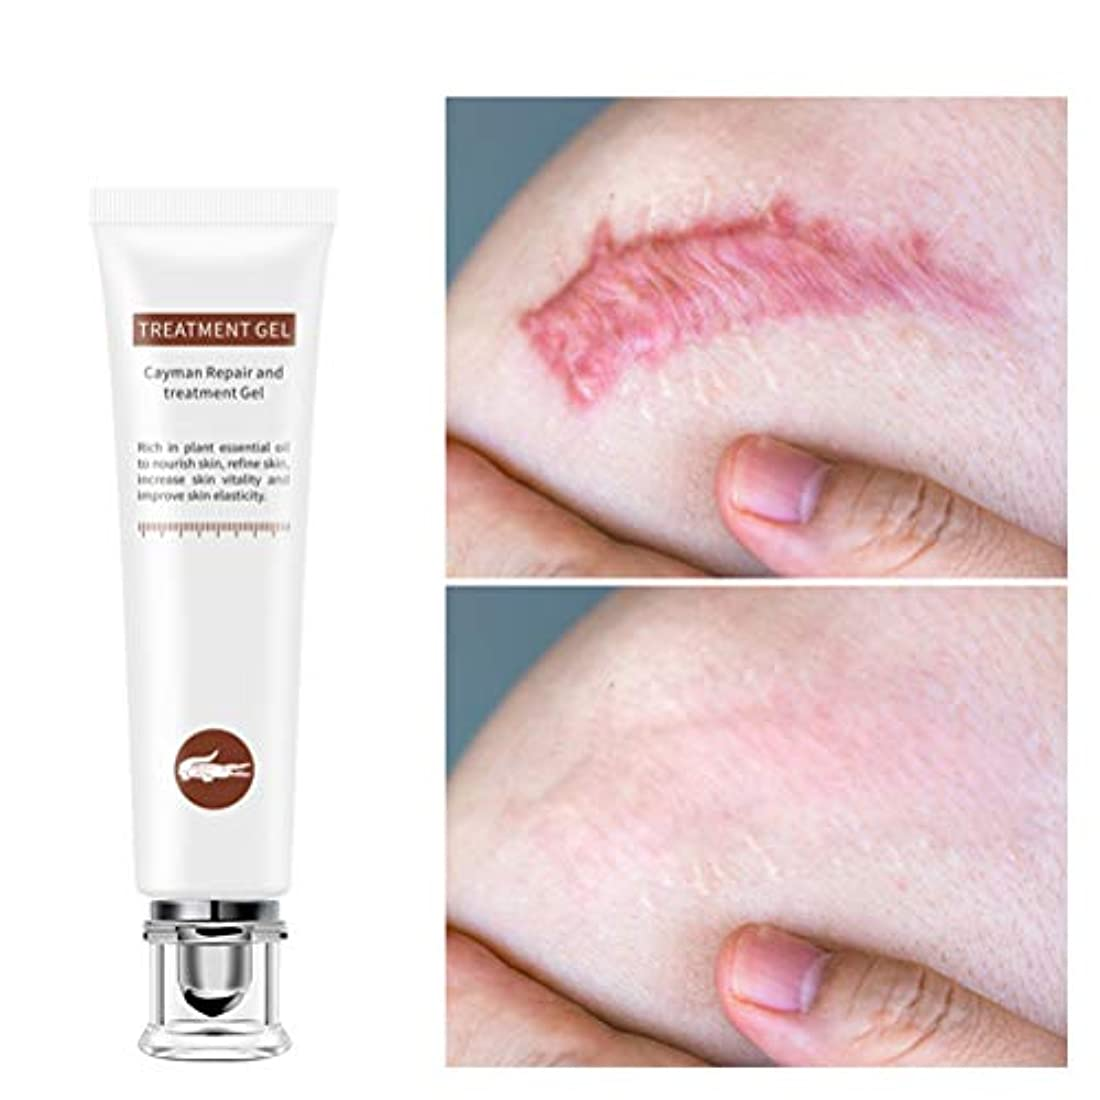 Ourine 瘢痕除去クリーム ホワイトニング 美白 傷跡うすくする 修復 斑点を除去し ストレッチマーク にきびプリント 肌に栄養を与え 妊娠線 美活肌エキス 傷跡 肌ケア 男女兼用